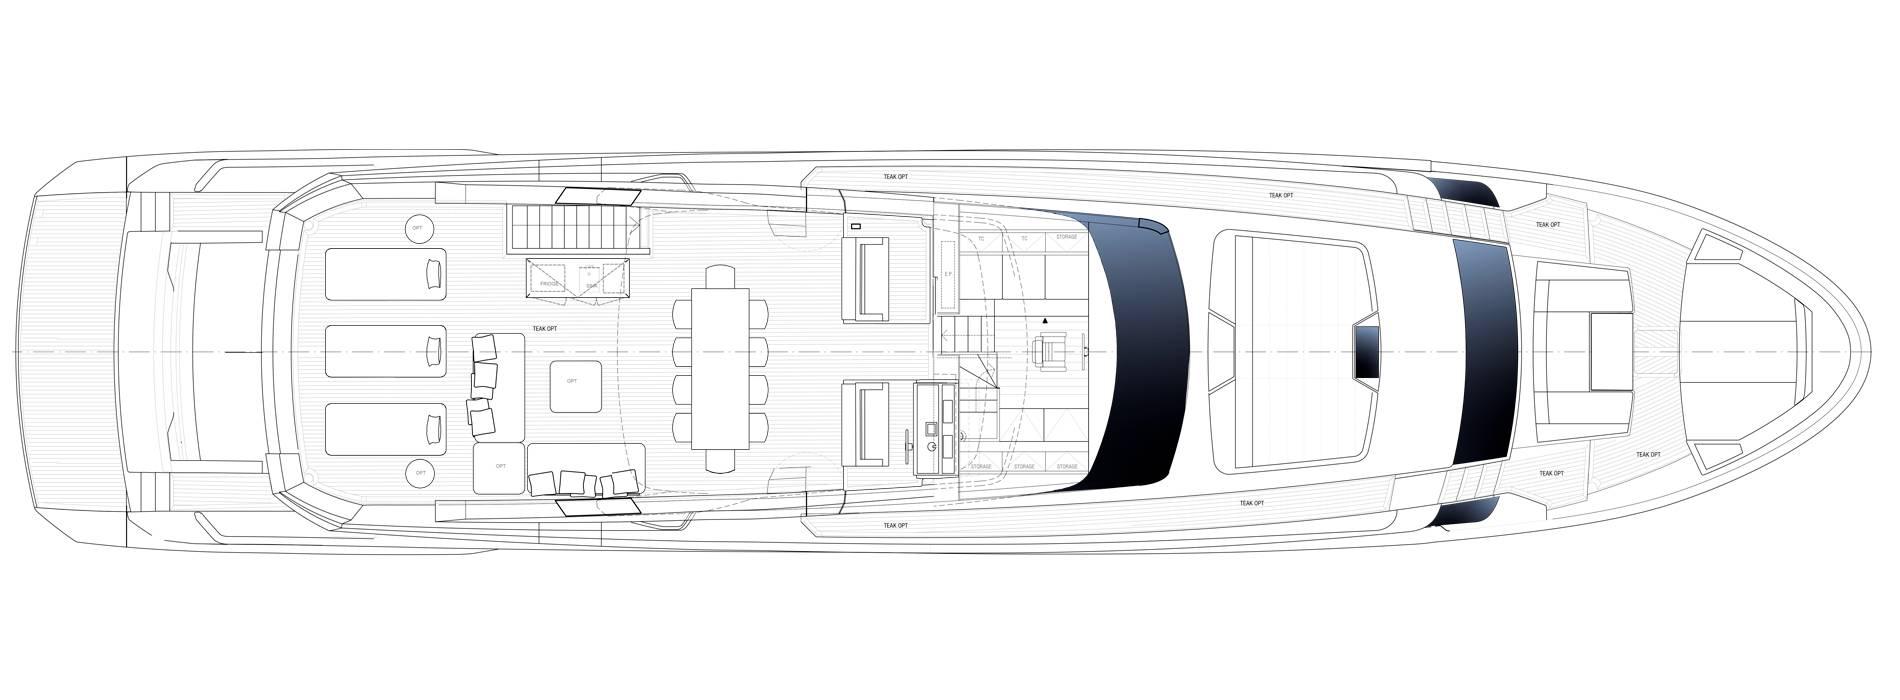 Sanlorenzo Yachts SL106 Asymmetric Flying bridge